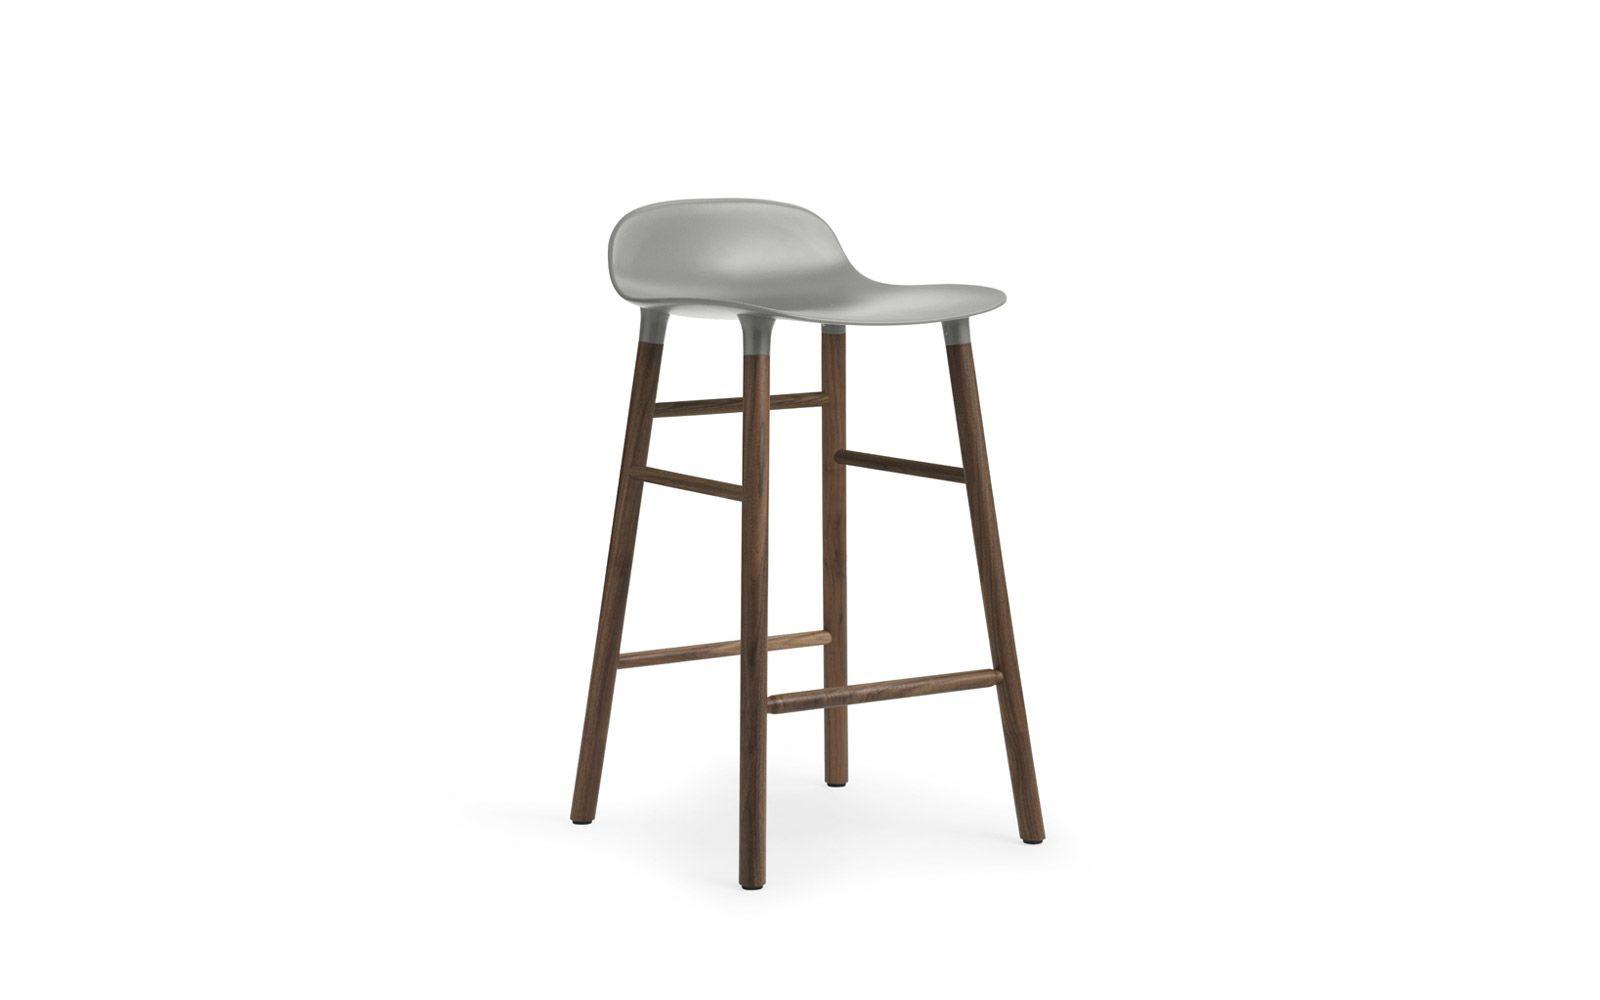 Swell Form Barstool Molded Plastic Shell Chair With Walnut Legs Machost Co Dining Chair Design Ideas Machostcouk